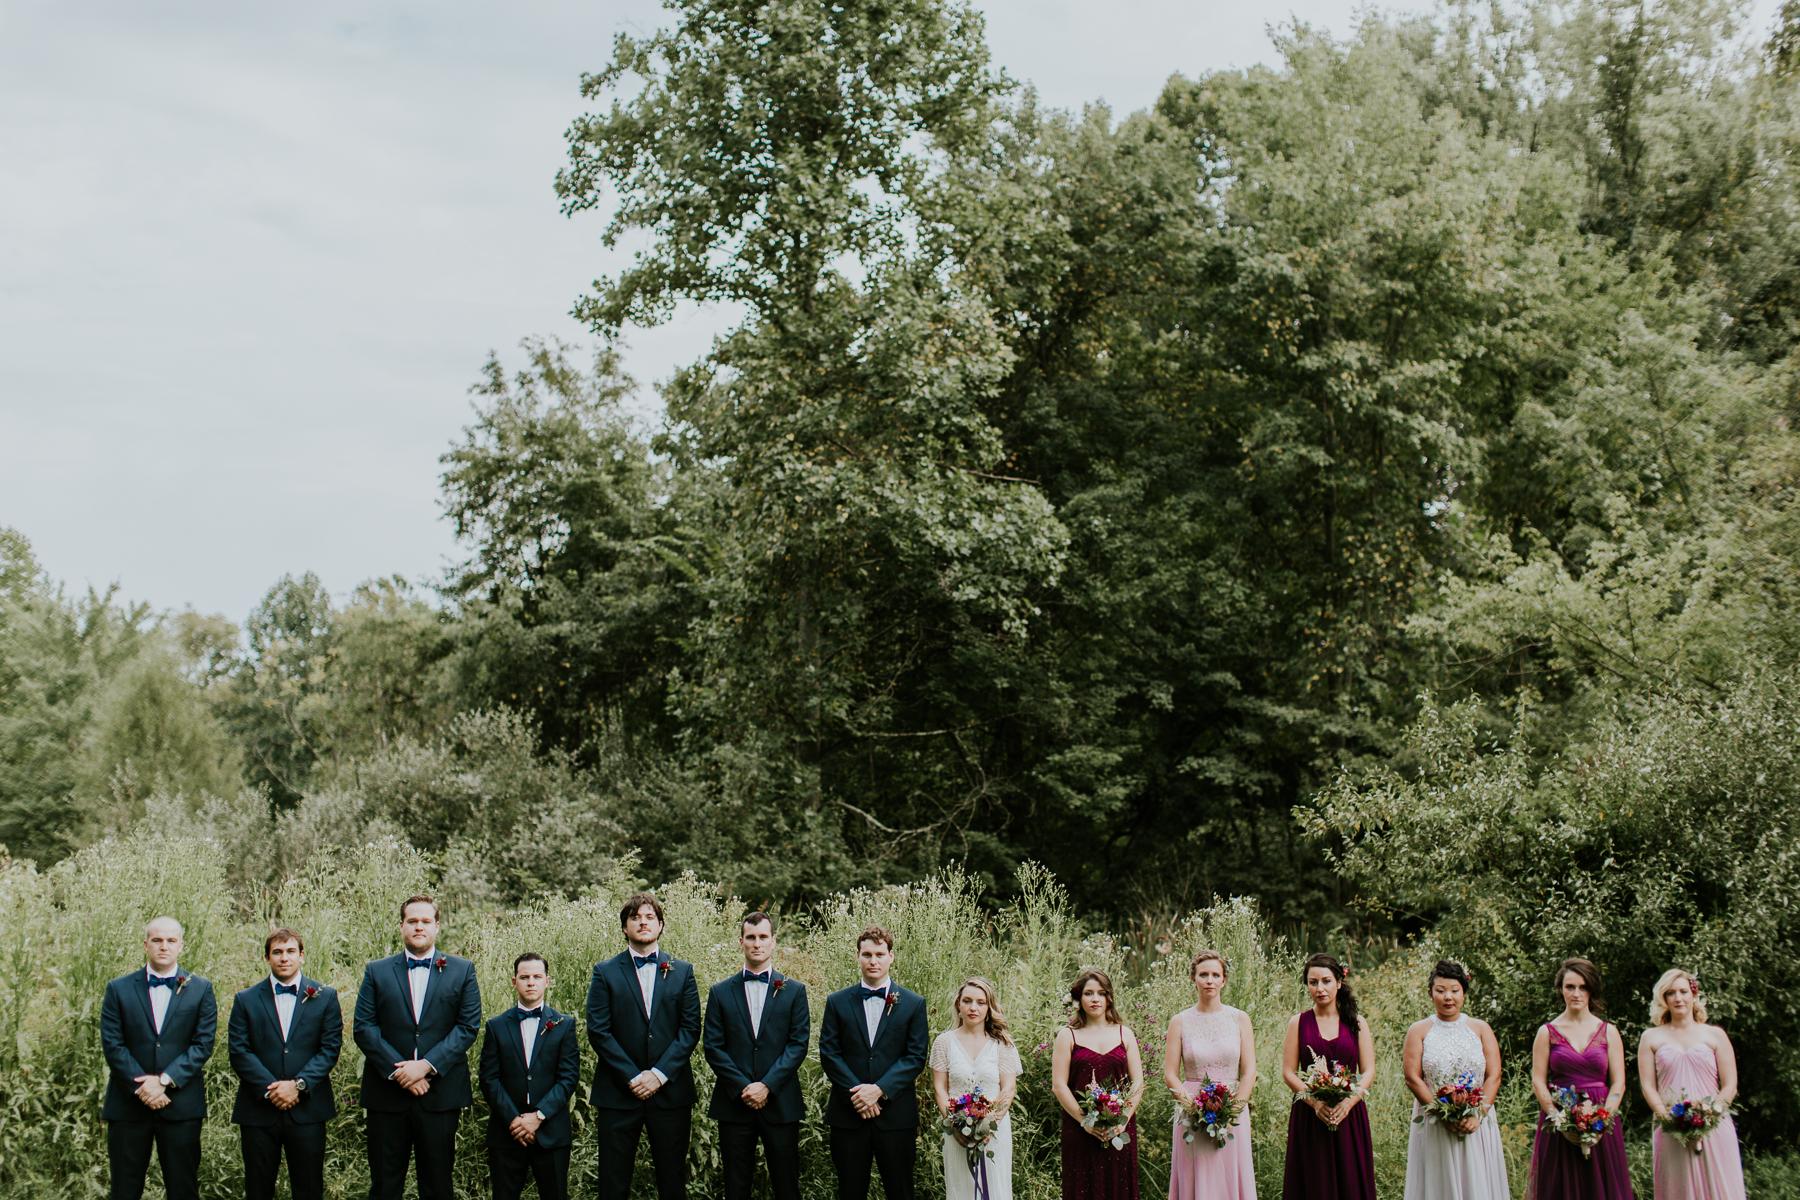 bridal-party-in-field-washington-dc-wedding-photographer-1.jpg